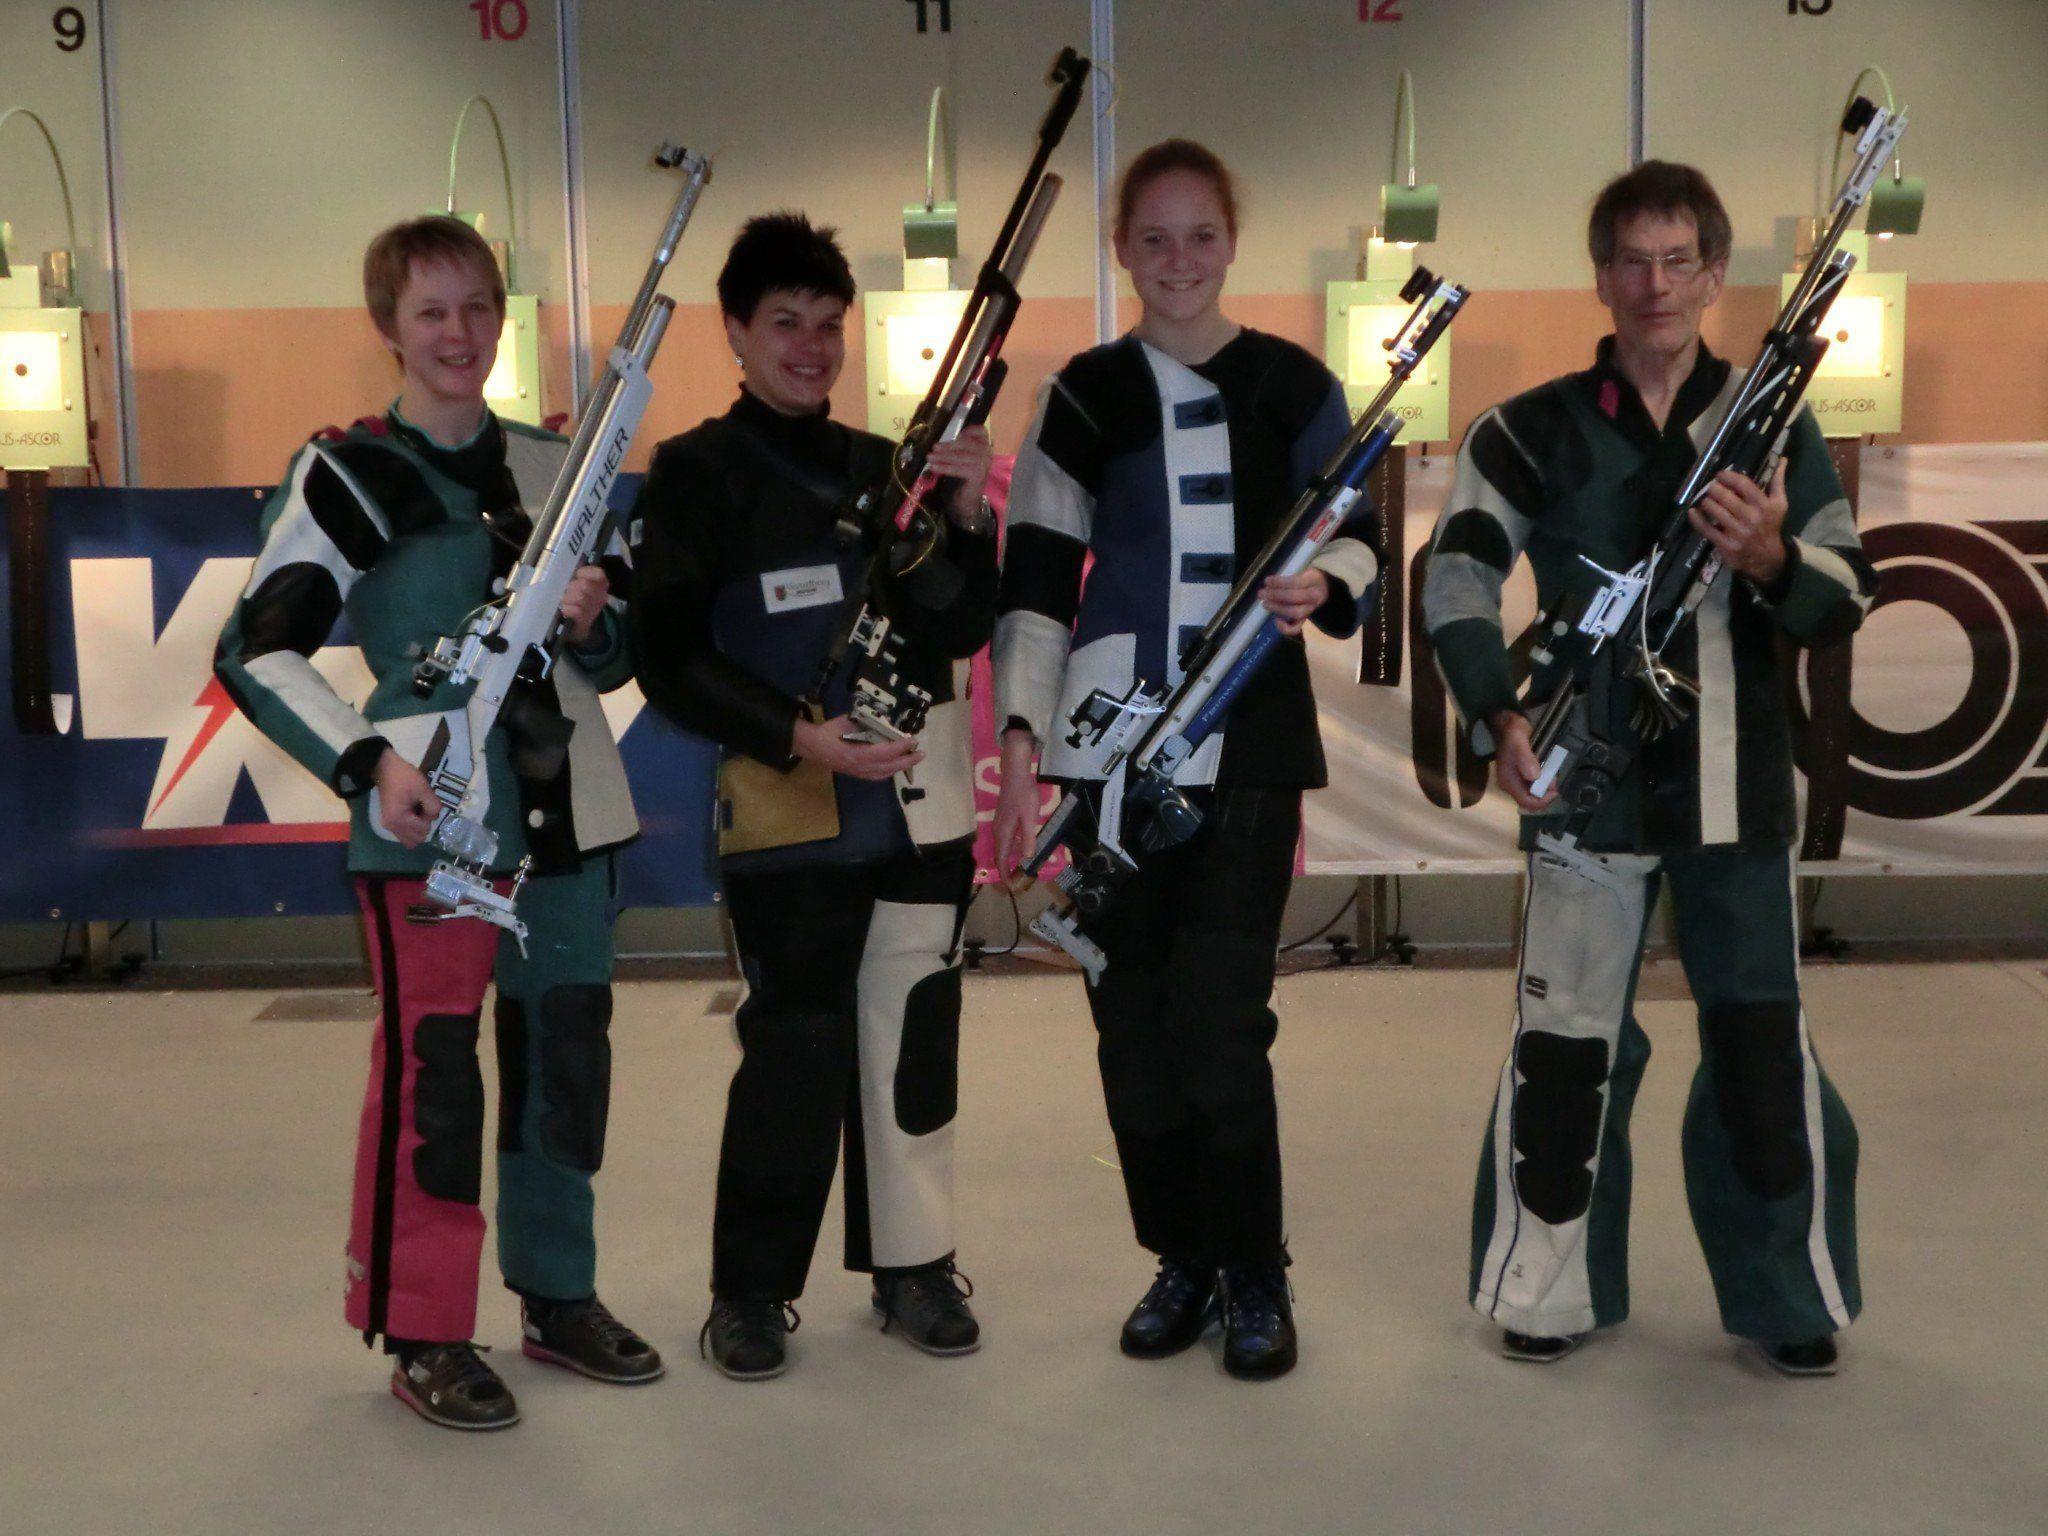 Im Bild v.l.n.r. Waltraud Metzler, Katja Rüscher, Bianca Egender, Josef Lang